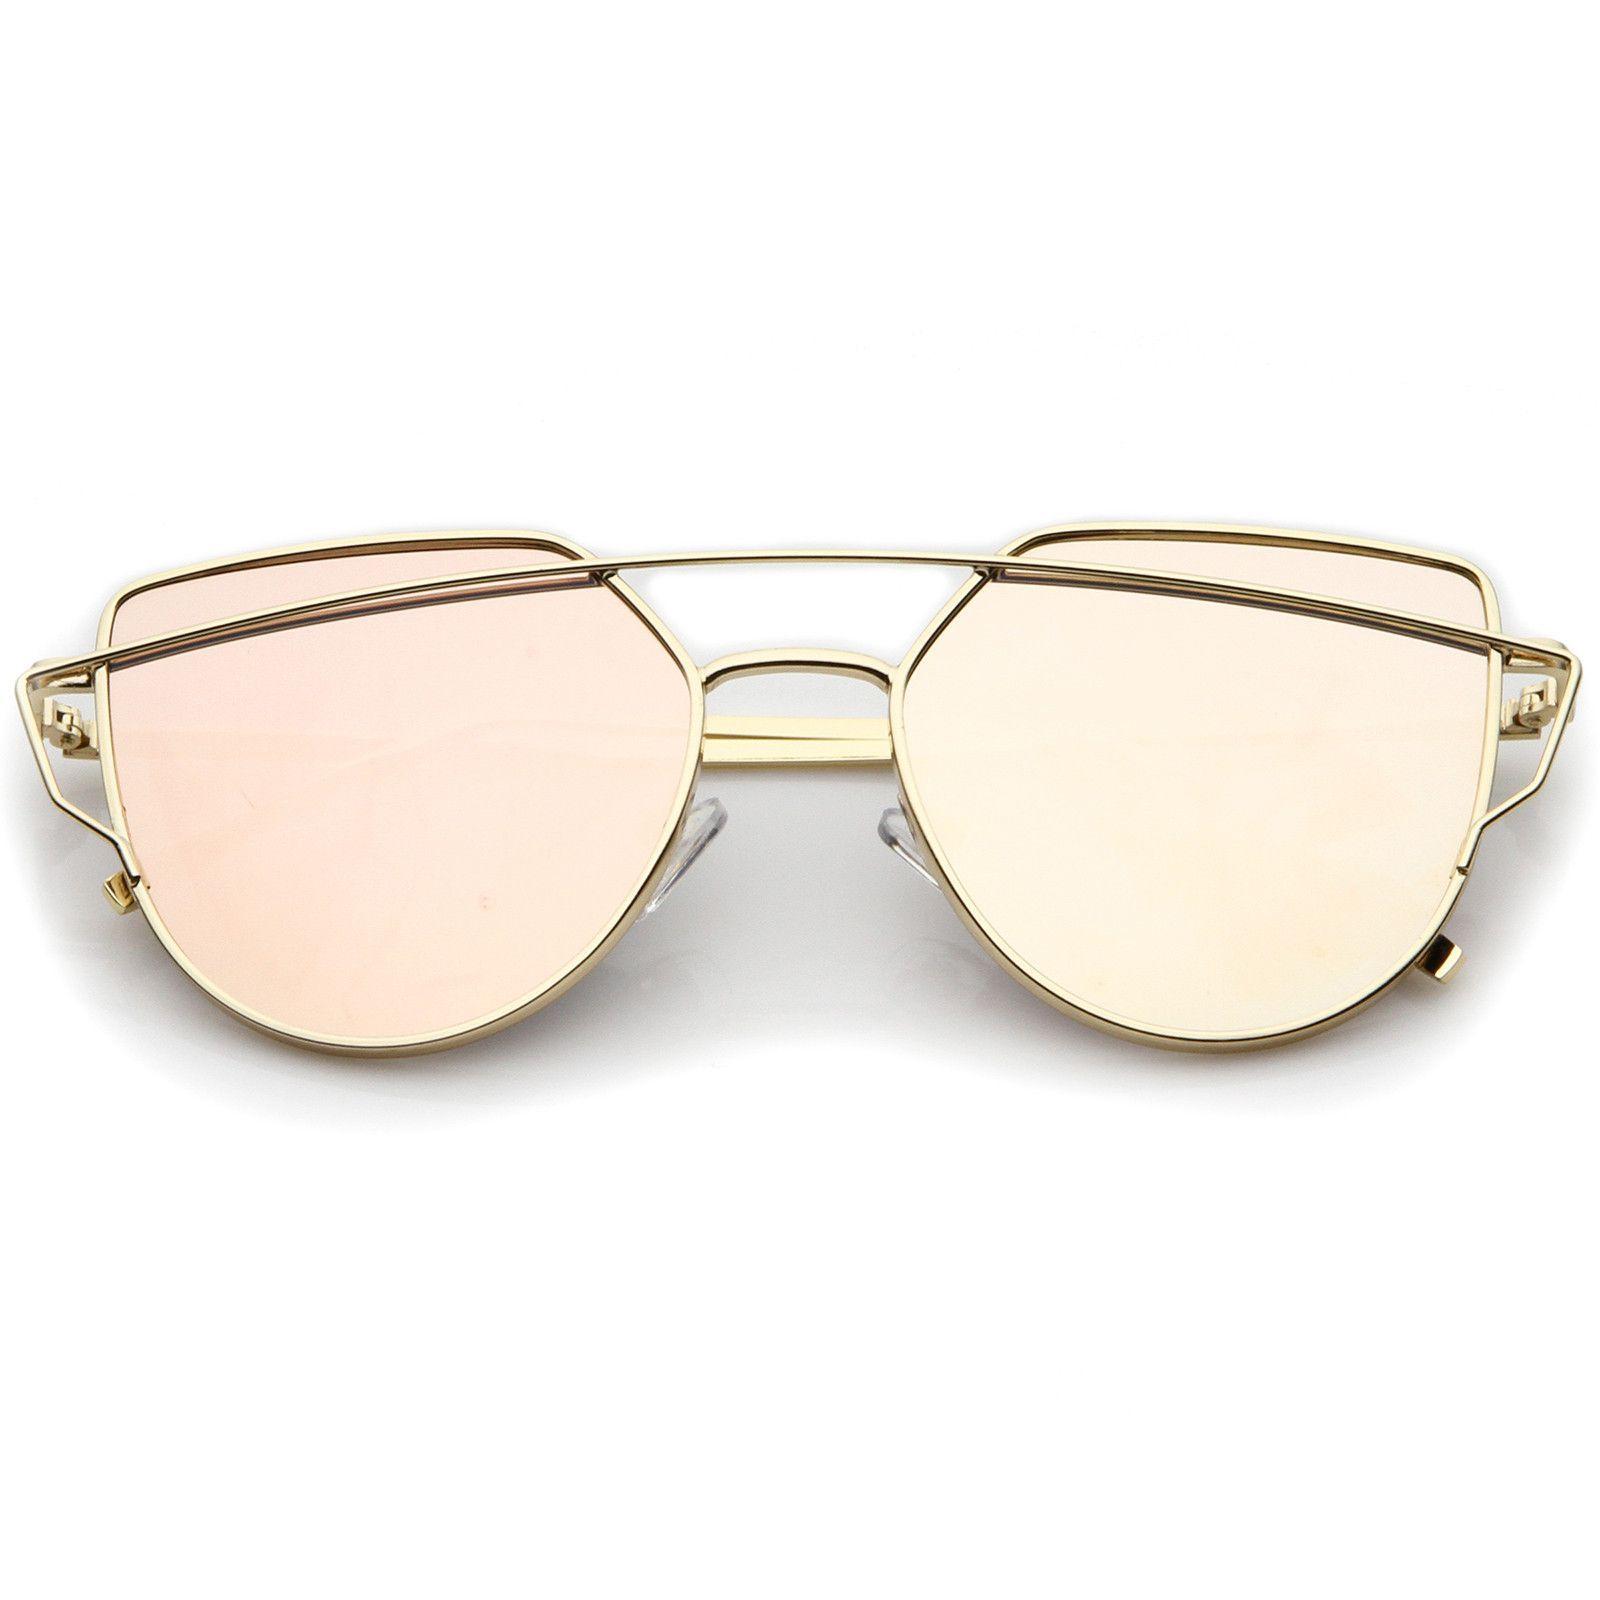 f3886600a2 Small Metal Frame Thin Temple Color Mirror Flat Lens Aviator Sunglasses  54mm  frame  sunglasses